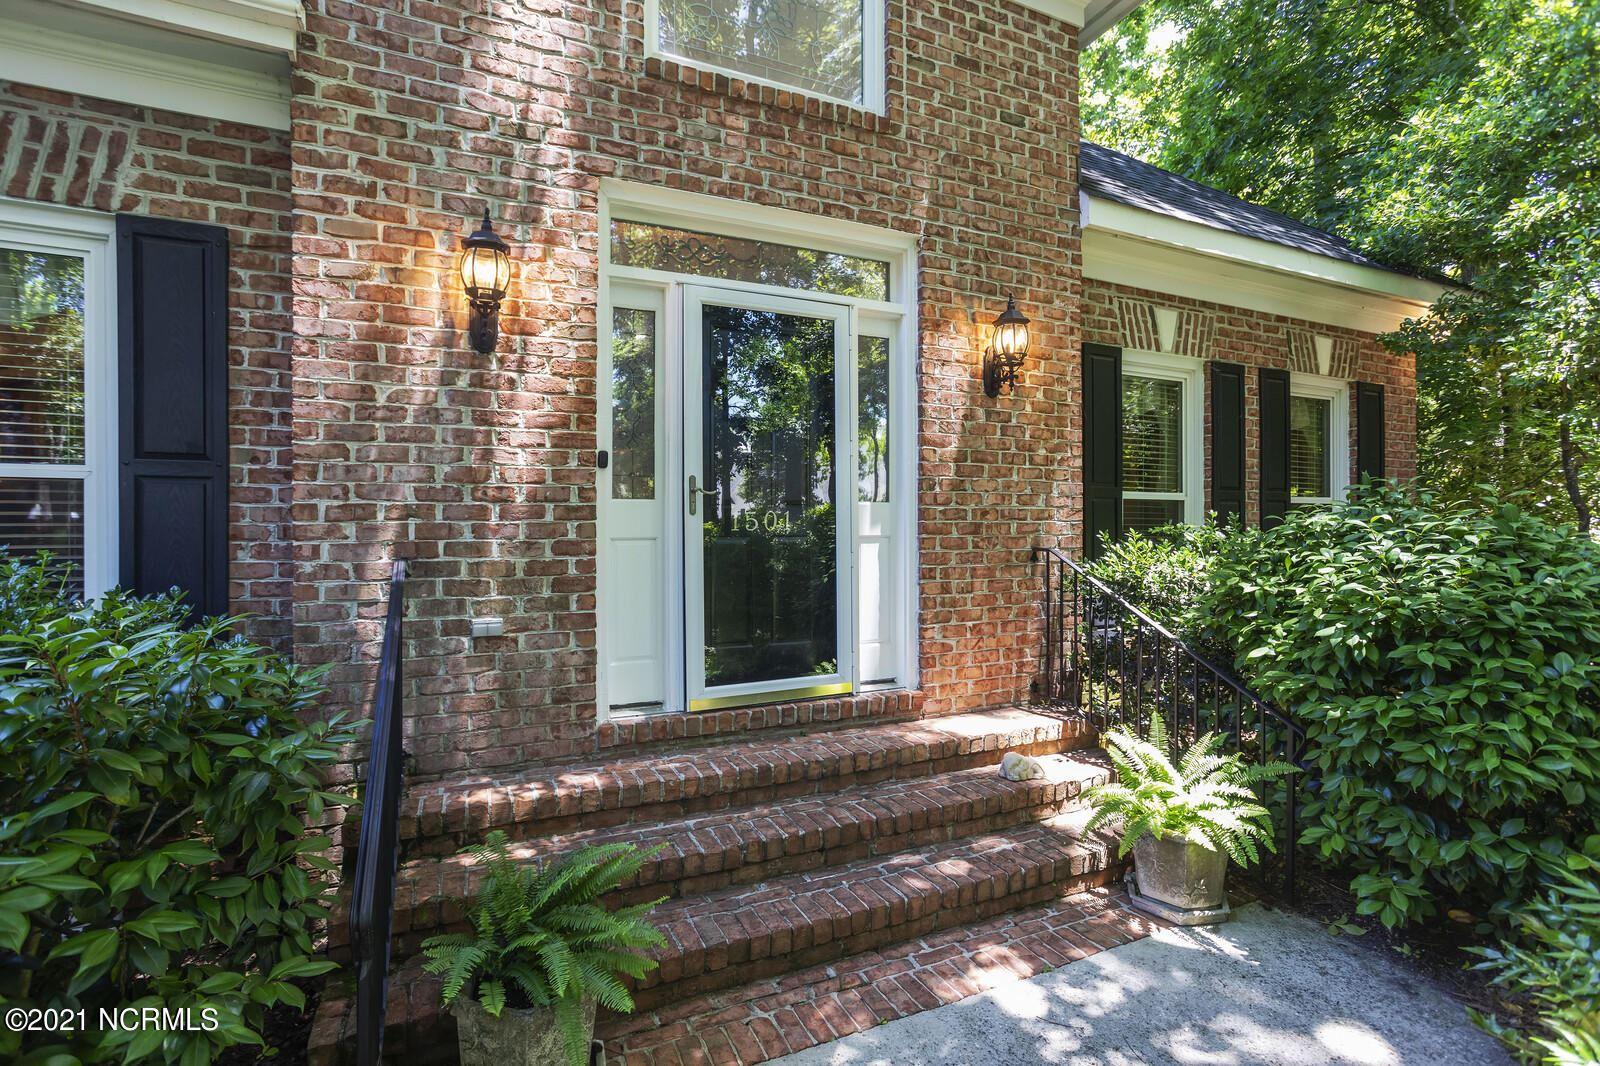 Photo of 1501 Meridian Terrace, Wilmington, NC 28411 (MLS # 100278611)